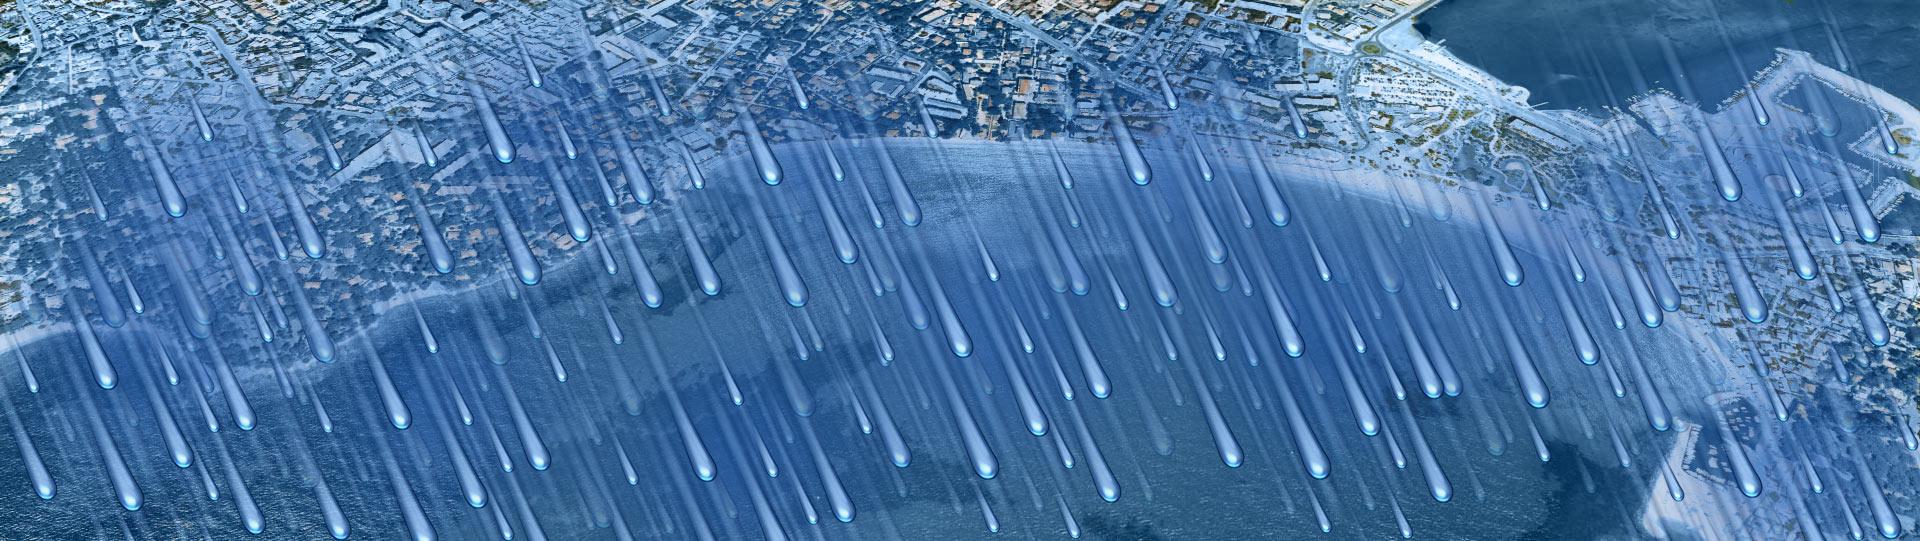 La Seyne sur Mer - Fermeture Baignade le 11/06/2018